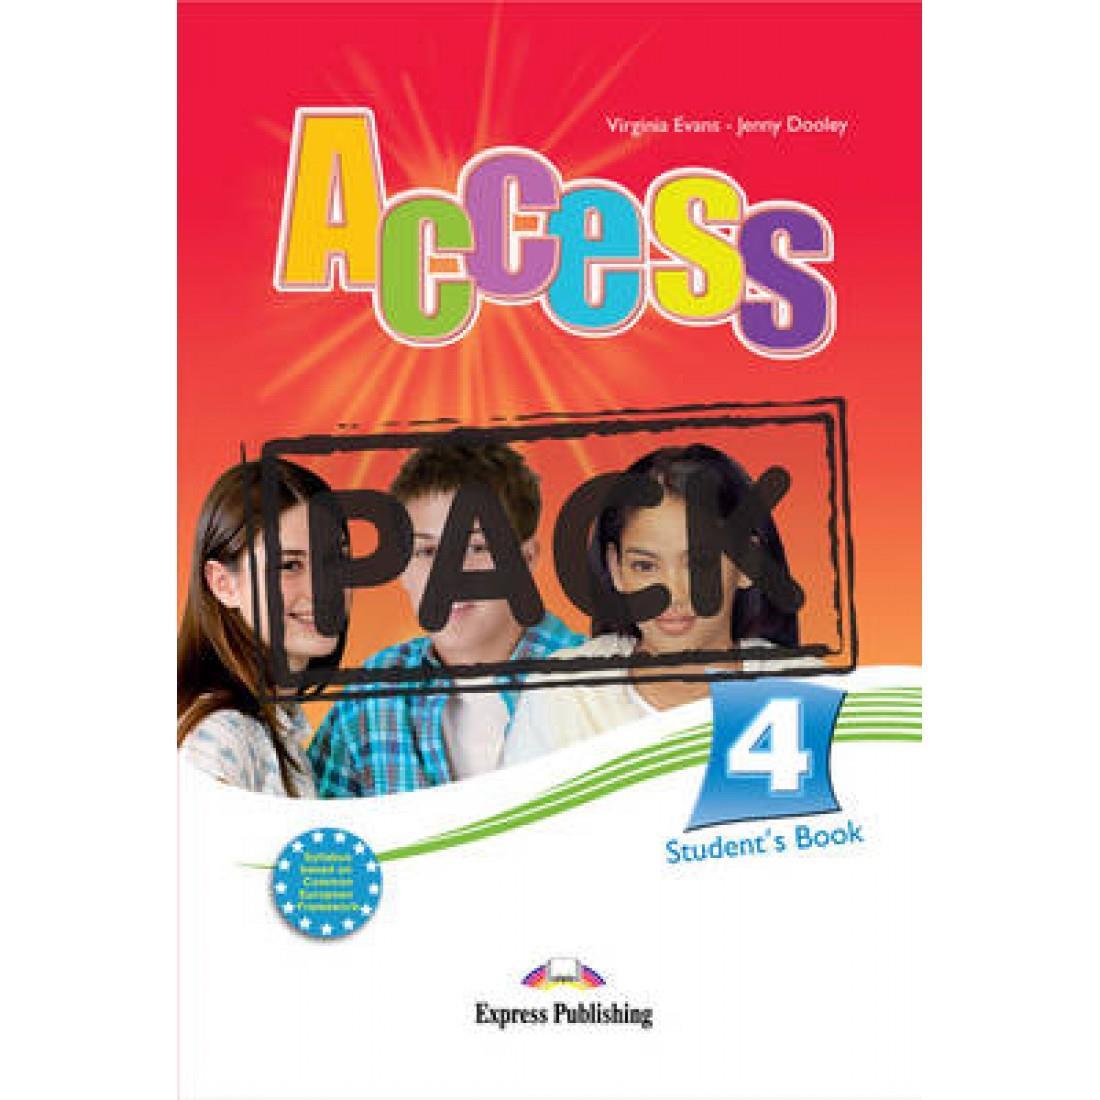 Access 4 ST BK - 1